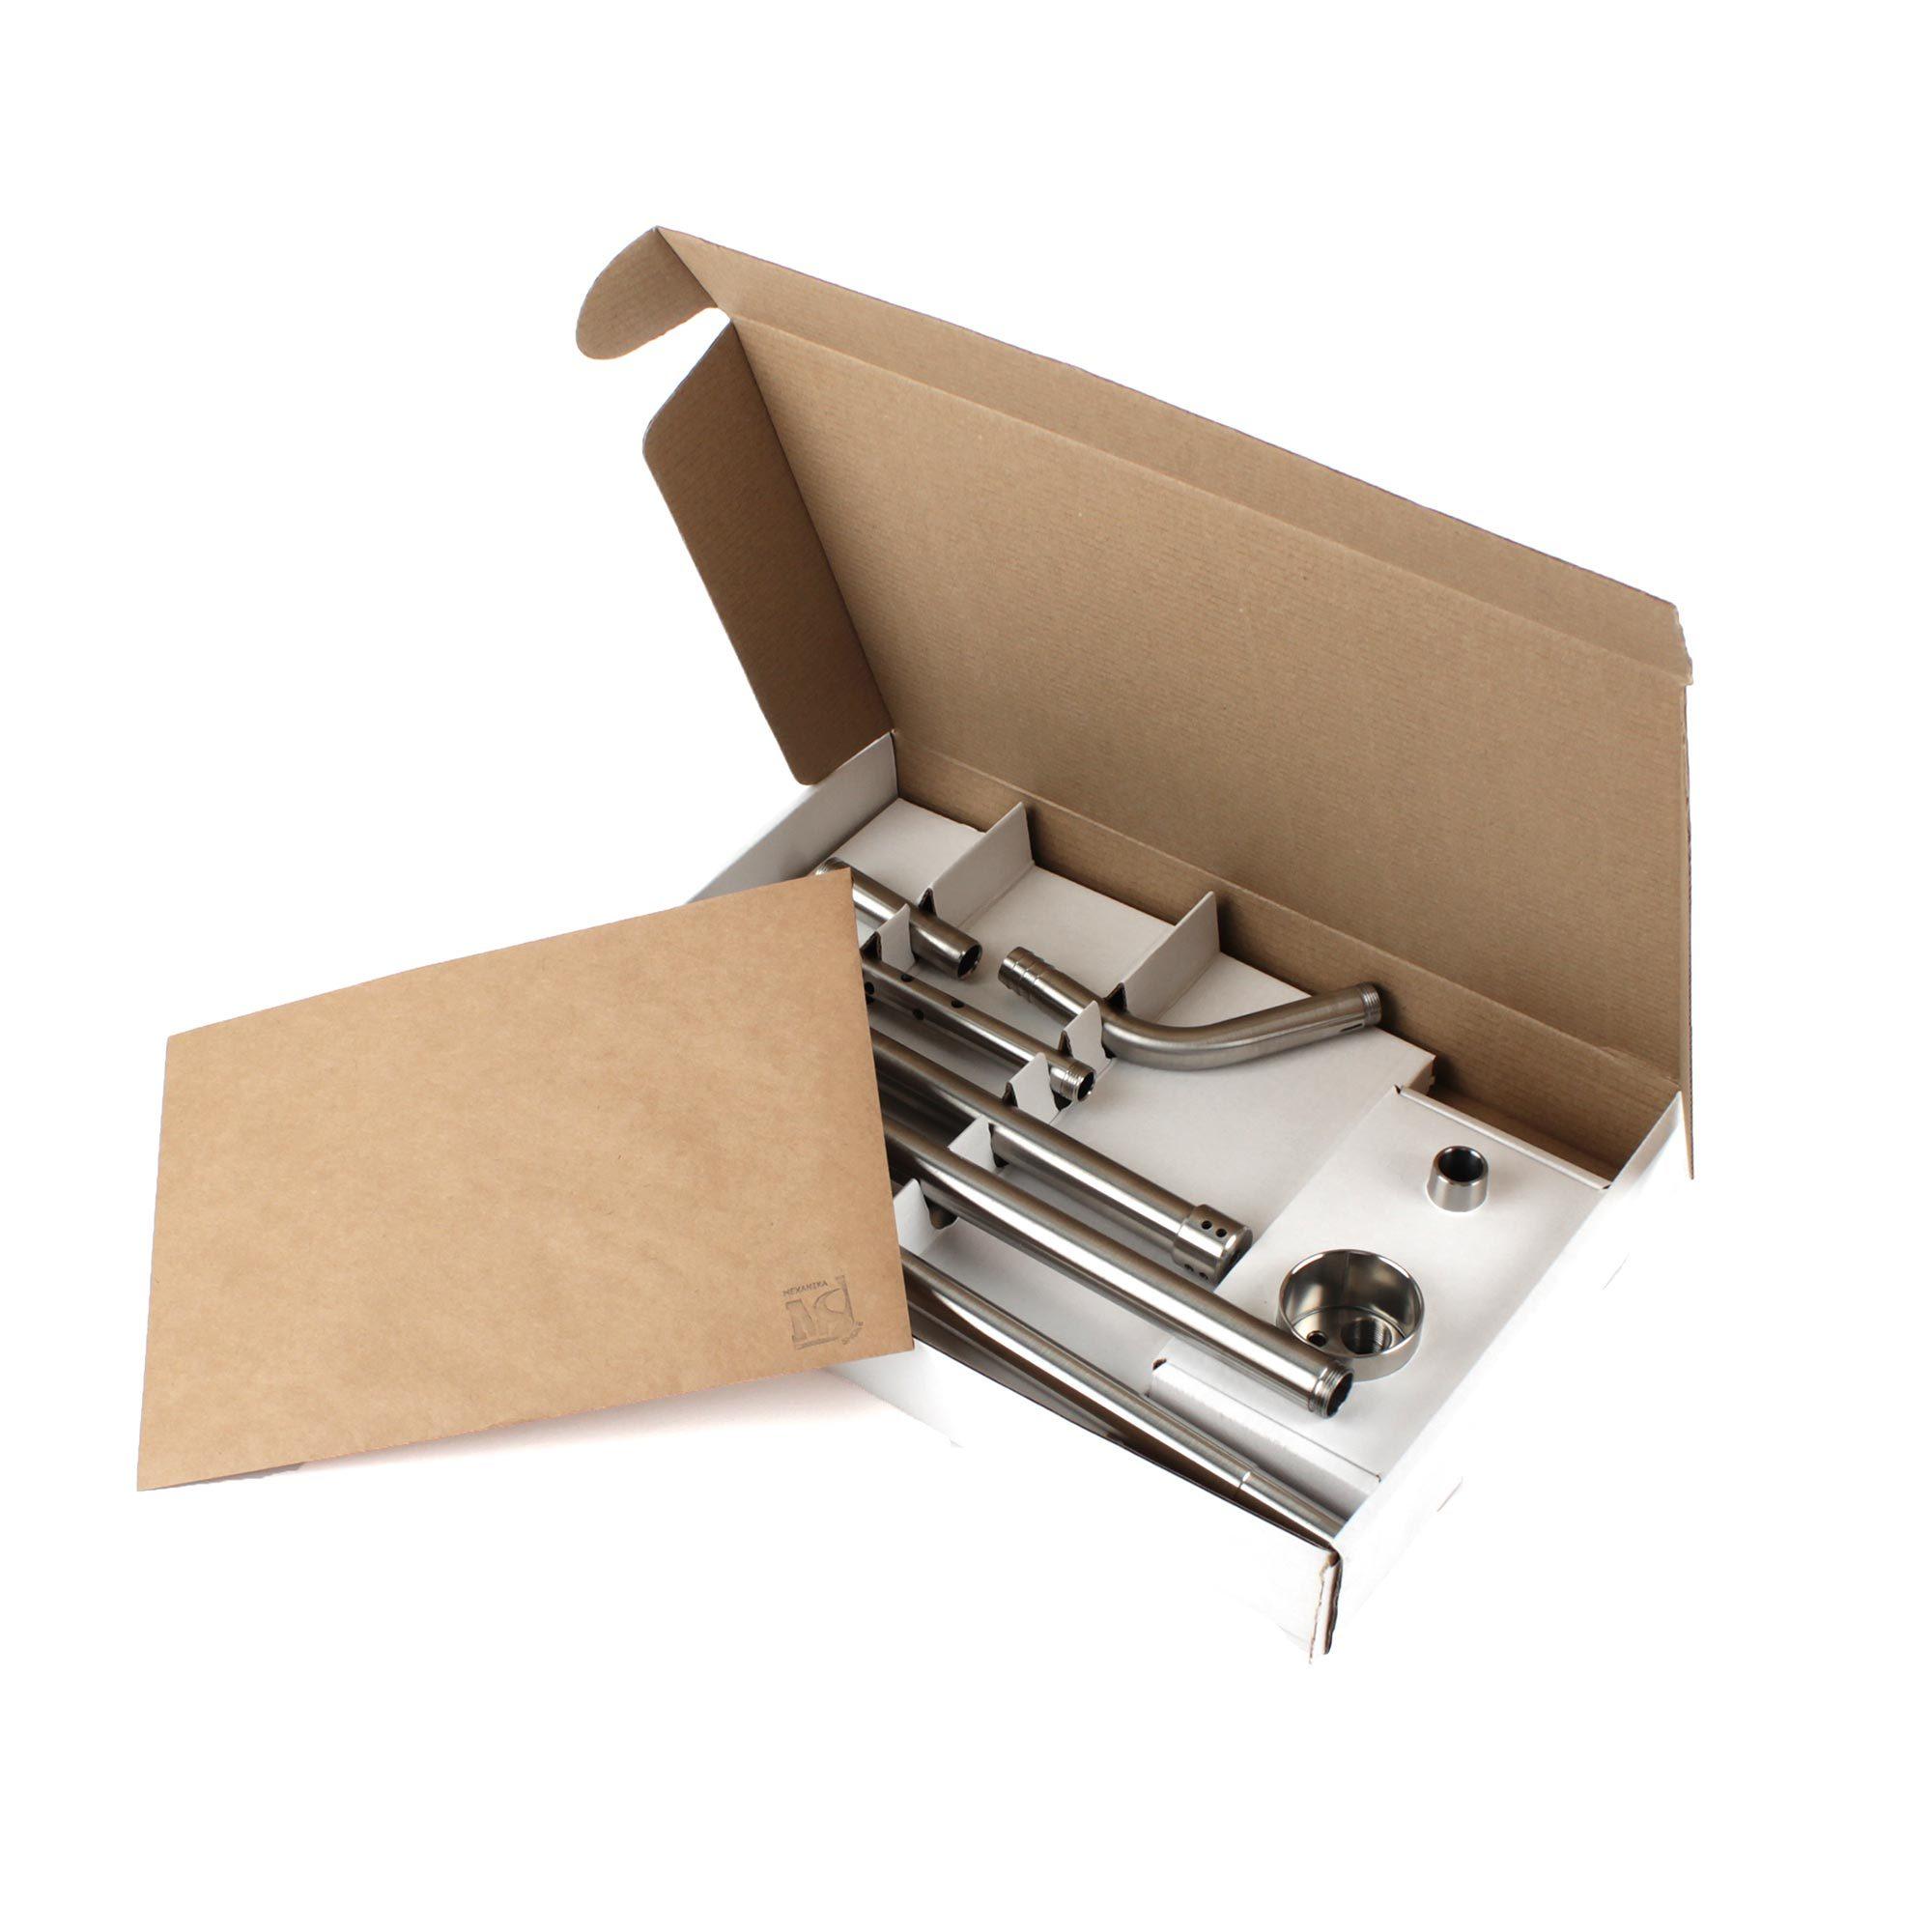 Фирменная коробка шахты Mexanika Smoke PAROVOZ (Limited Edition)